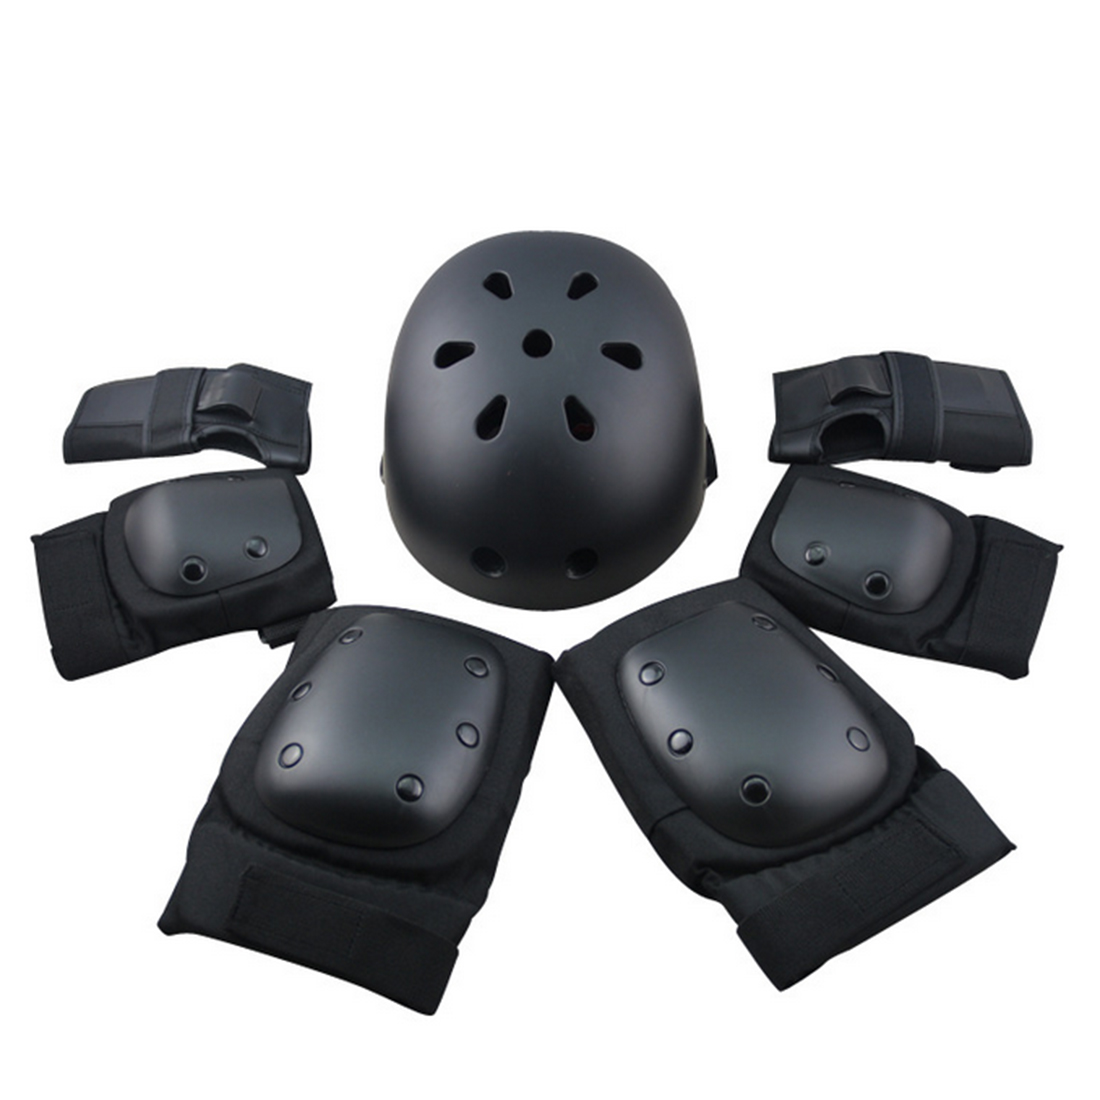 7Pcs Set Sport Safety Helmet Protective Gear Elbow pads Wrist Kneecap Guard for Kids Adult Skateboard Skating Riding Pulseira<br>